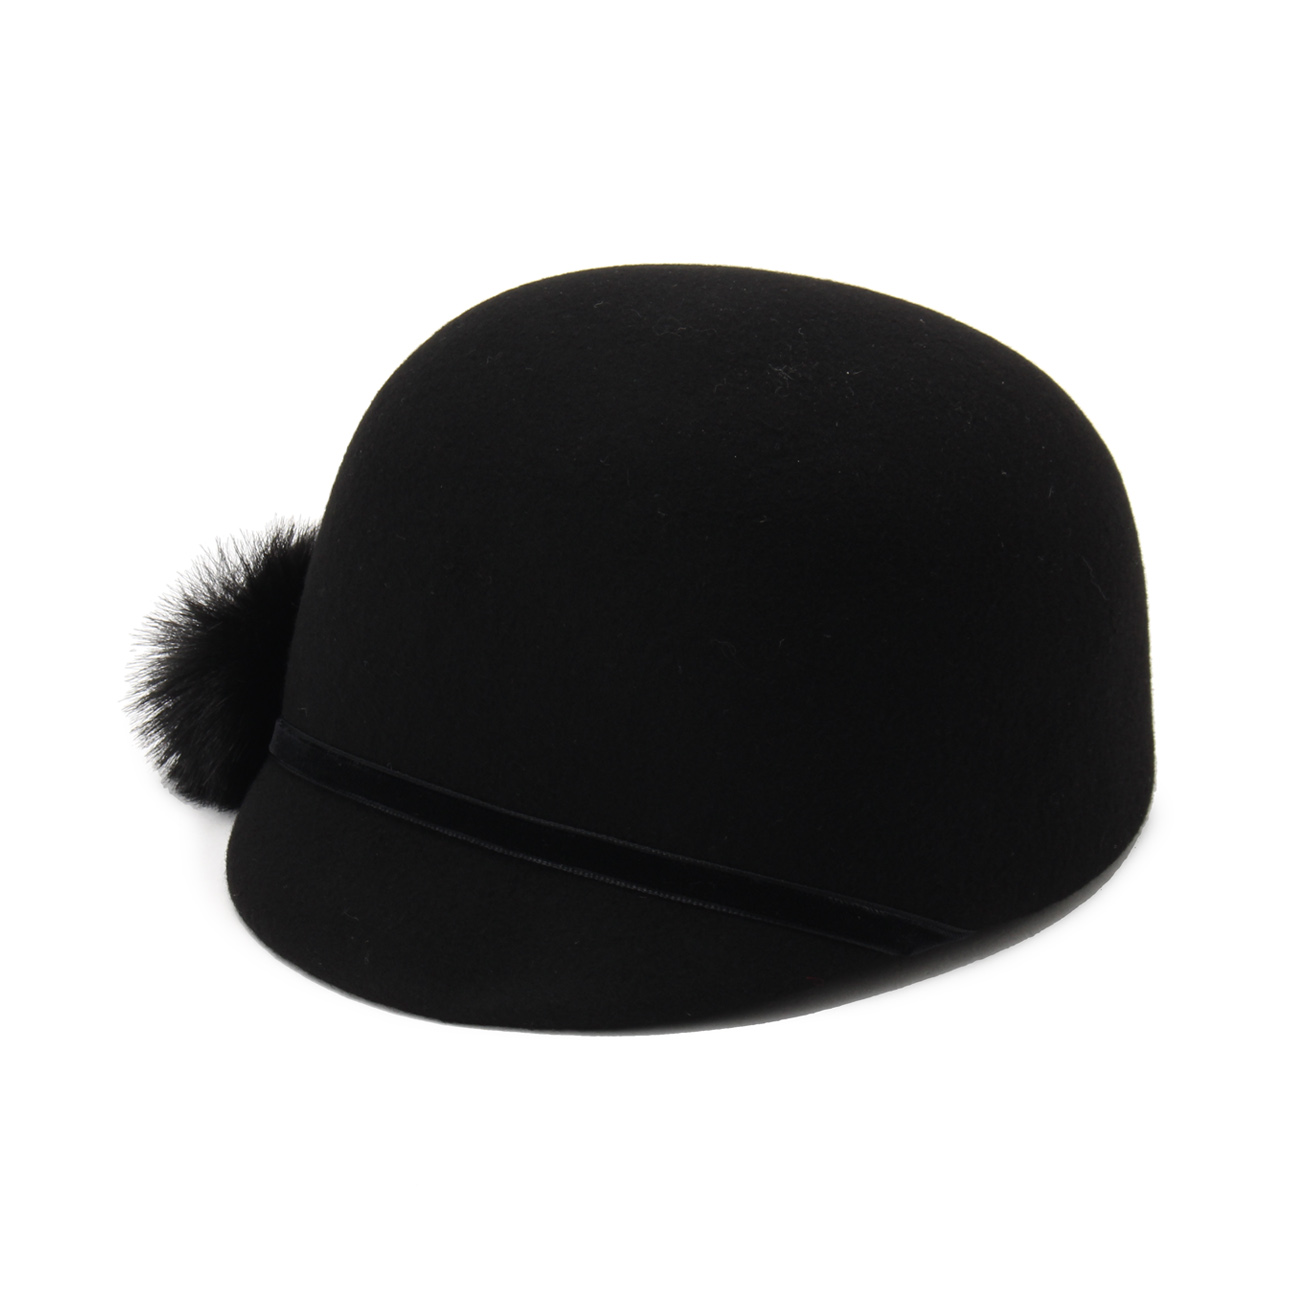 【Modify (モディファイ)】HATS&DREAMSポンポン付ライディングハットレディース 帽子|その他帽子 ブラック